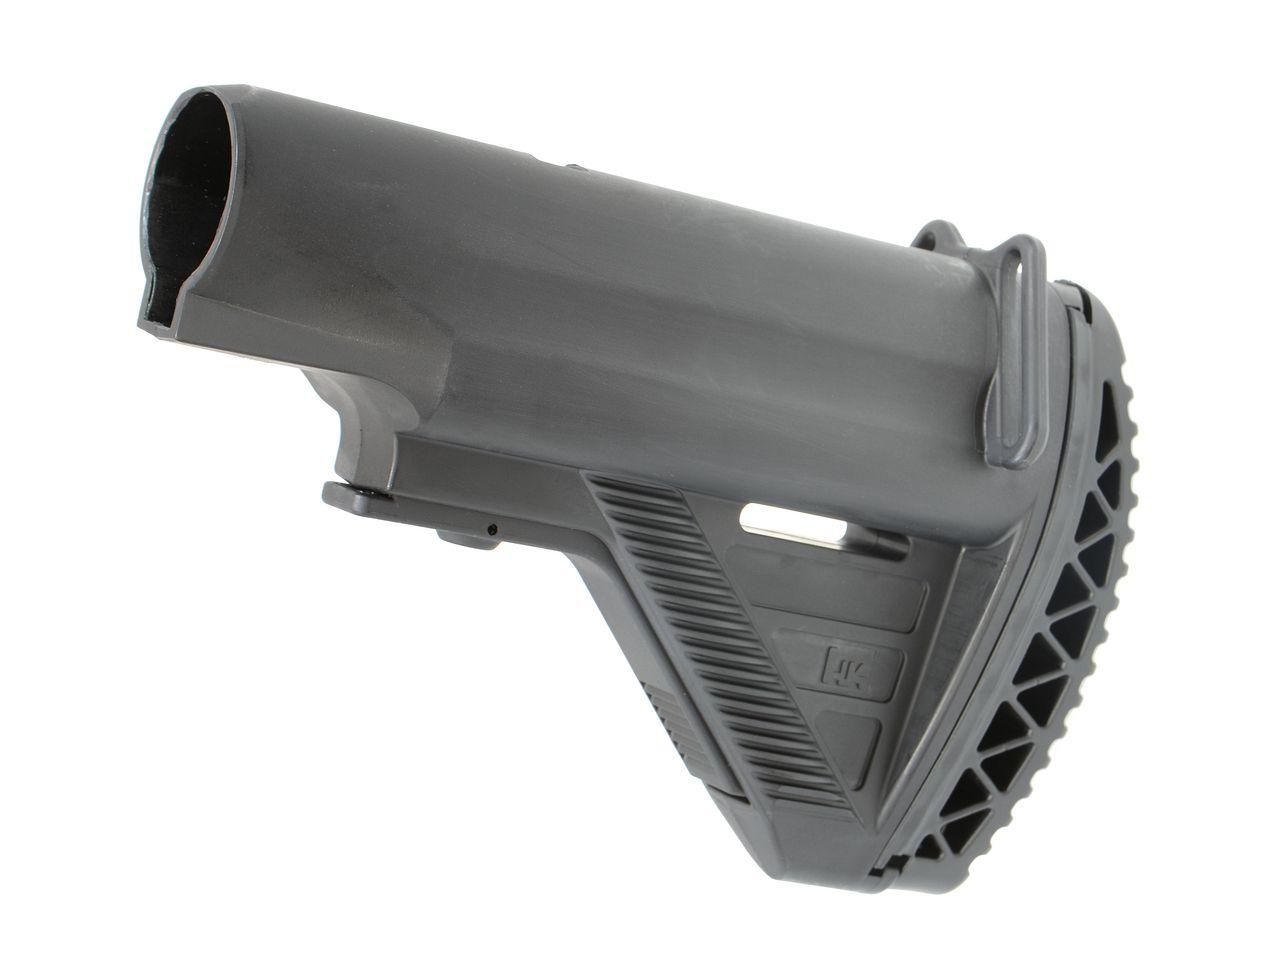 VFC/Umarex  HK417 テレスコピックストック/Convexバットキャップ